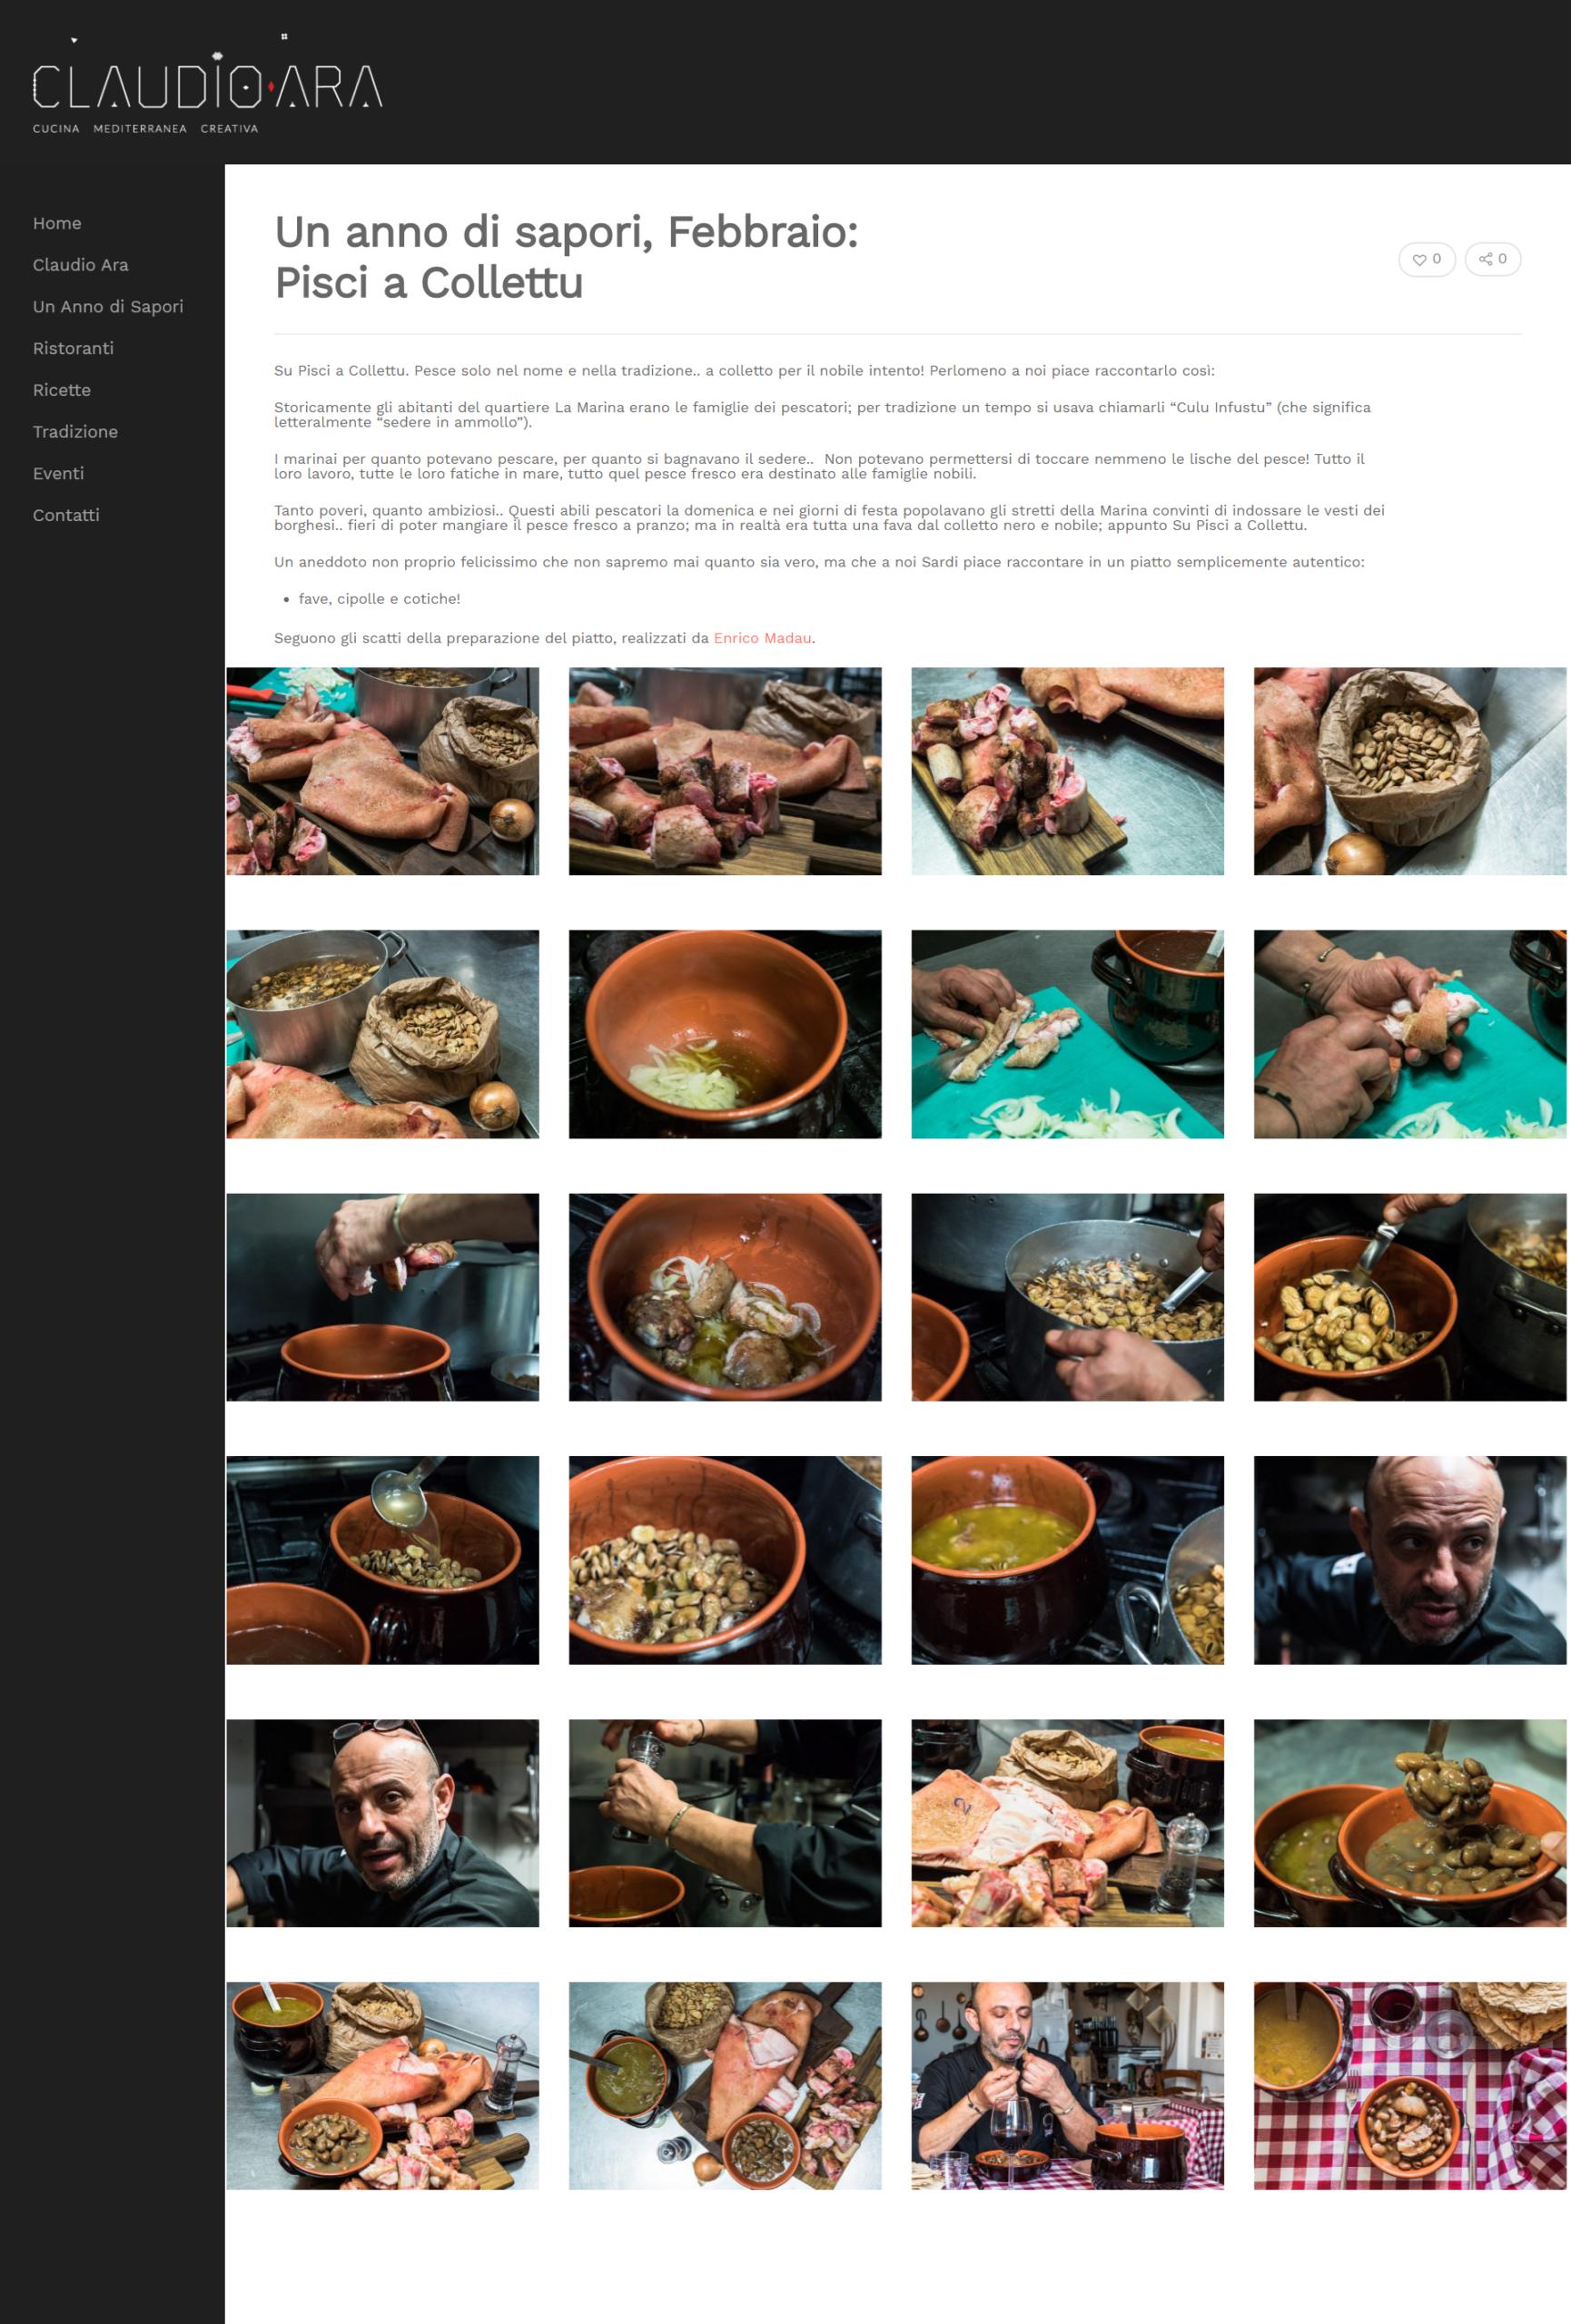 Copywriting siti web aziendali - AutoreDigitale ©